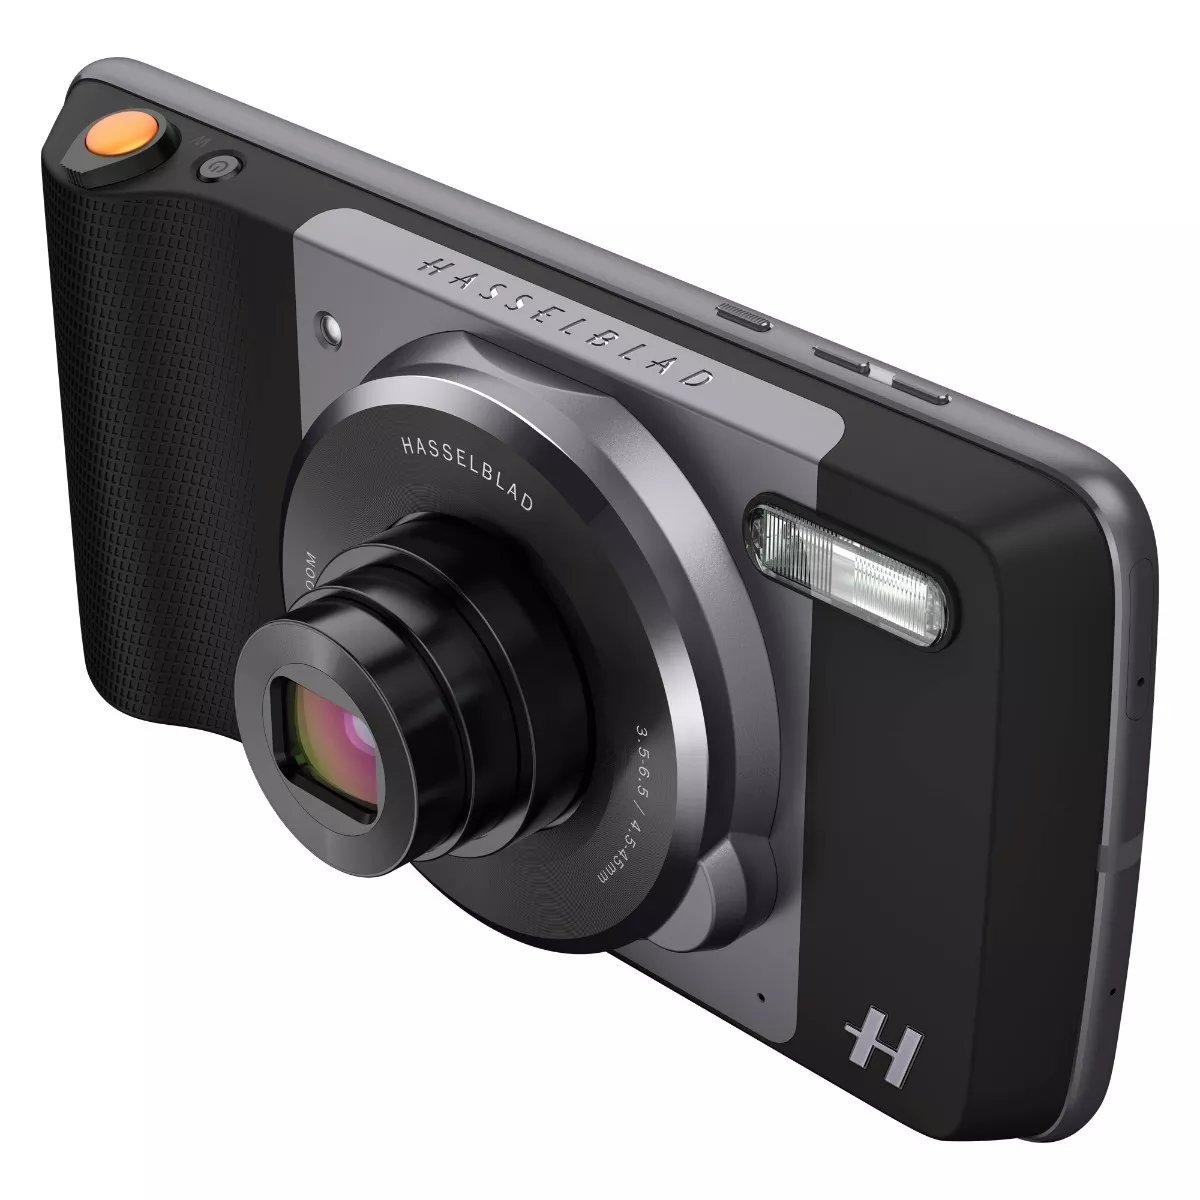 Moto Mod Motorola Hasselblad Zoom